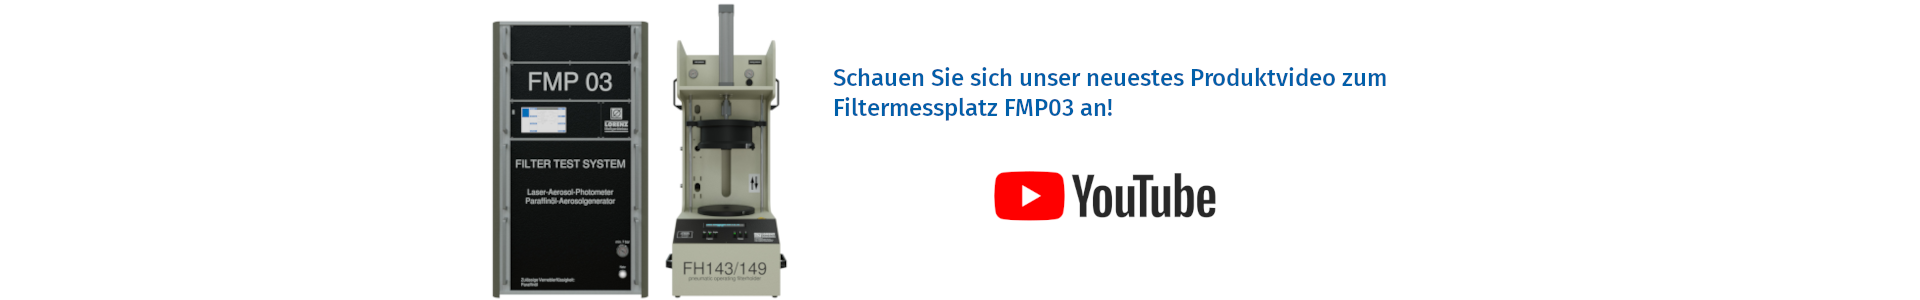 FMP03 Produktpräsentation